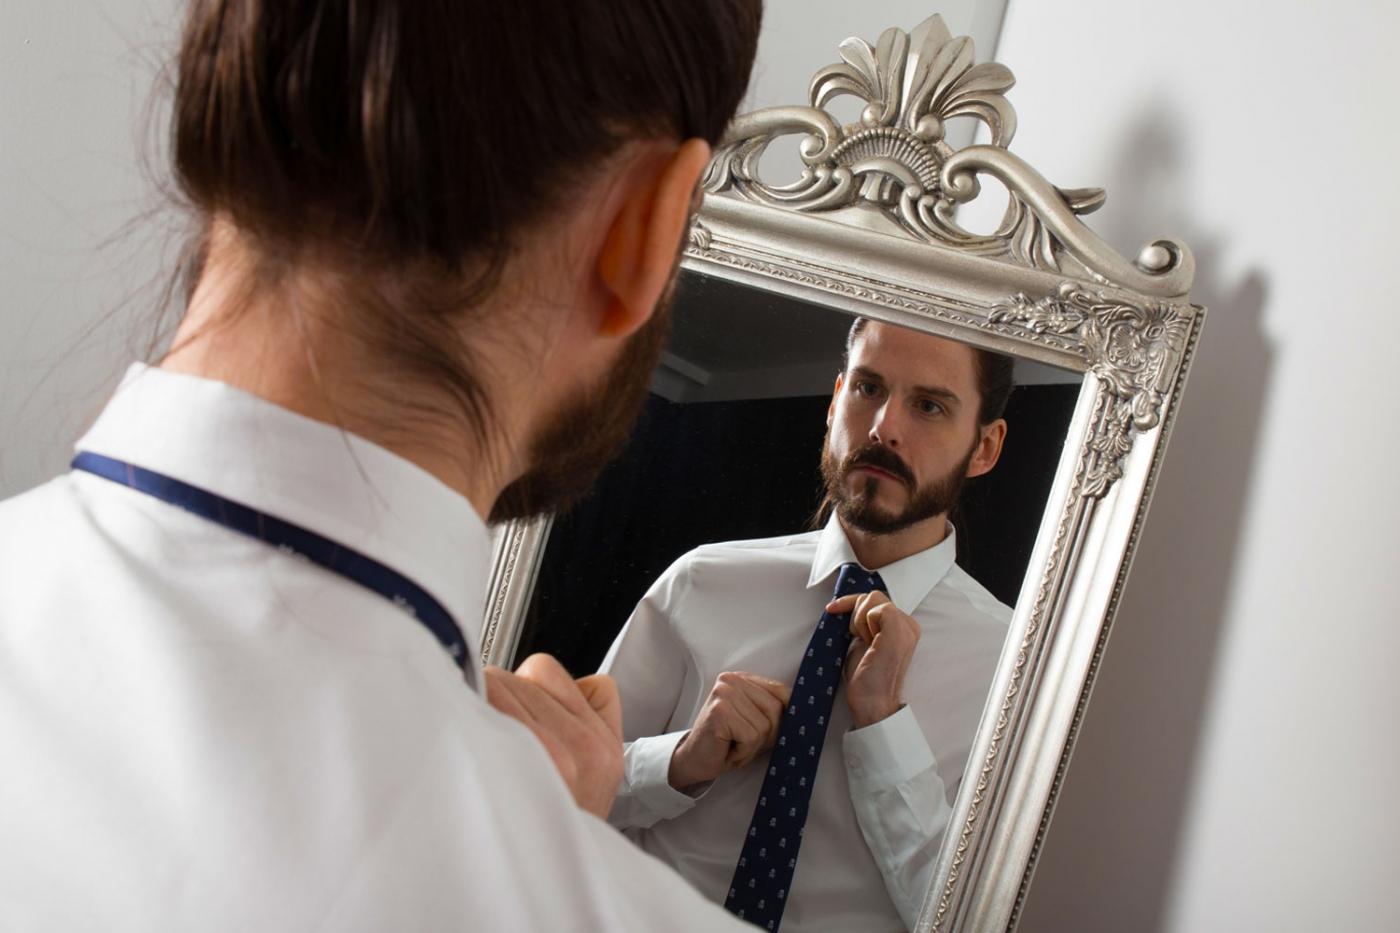 kaisers-neue-kleider-gentsbox-accessoires-abobox-gentleman-krawatte-beauty-socken